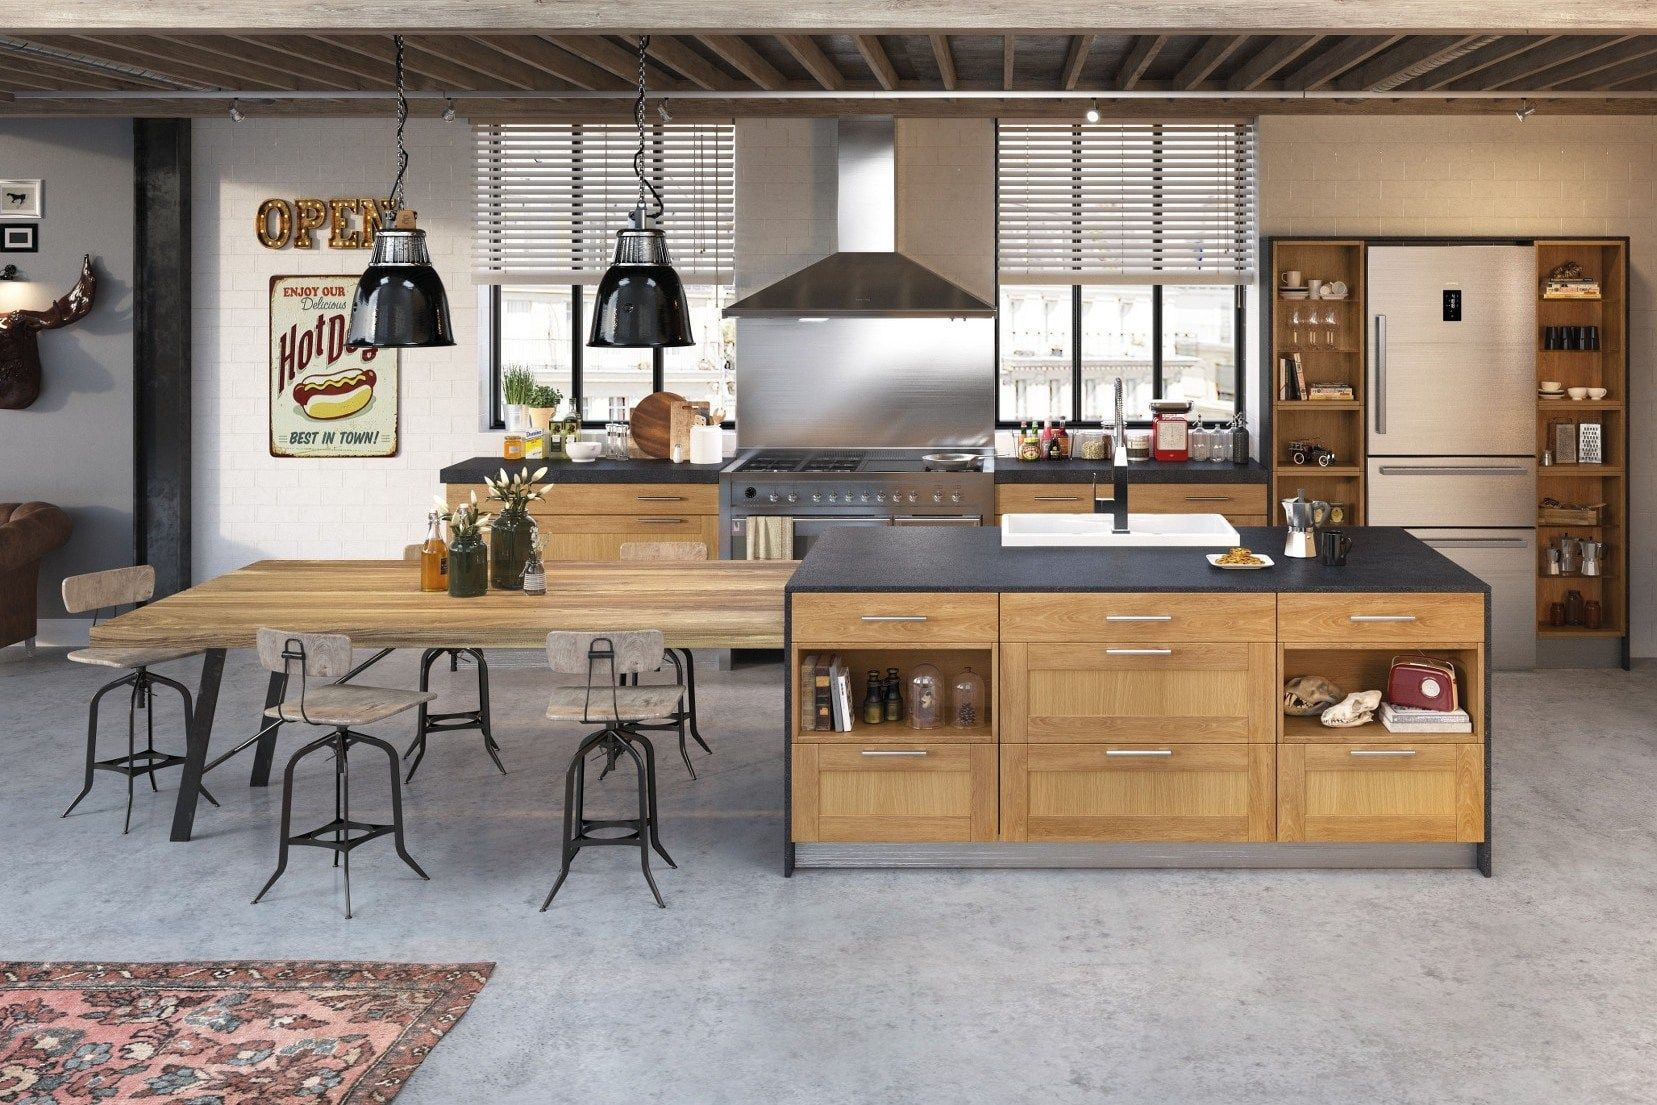 Cuisine Amenagee Style Bistrot La Bar Cuisine Moderne Cuisine Equipee Moderne Cuisine Style Industriel